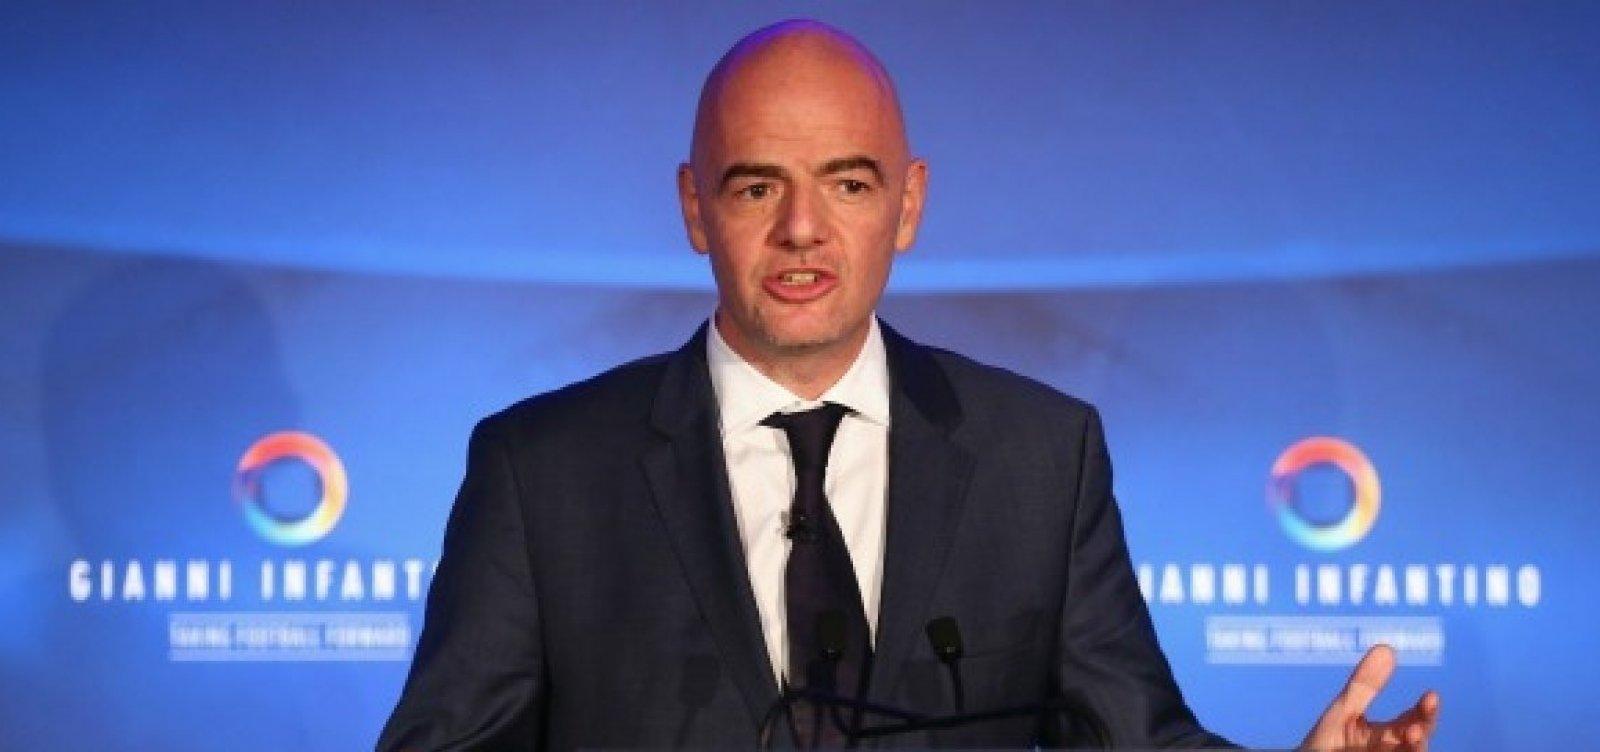 Presidente da Fifa favoreceu Manchester City e PSG, aponta Football Leaks